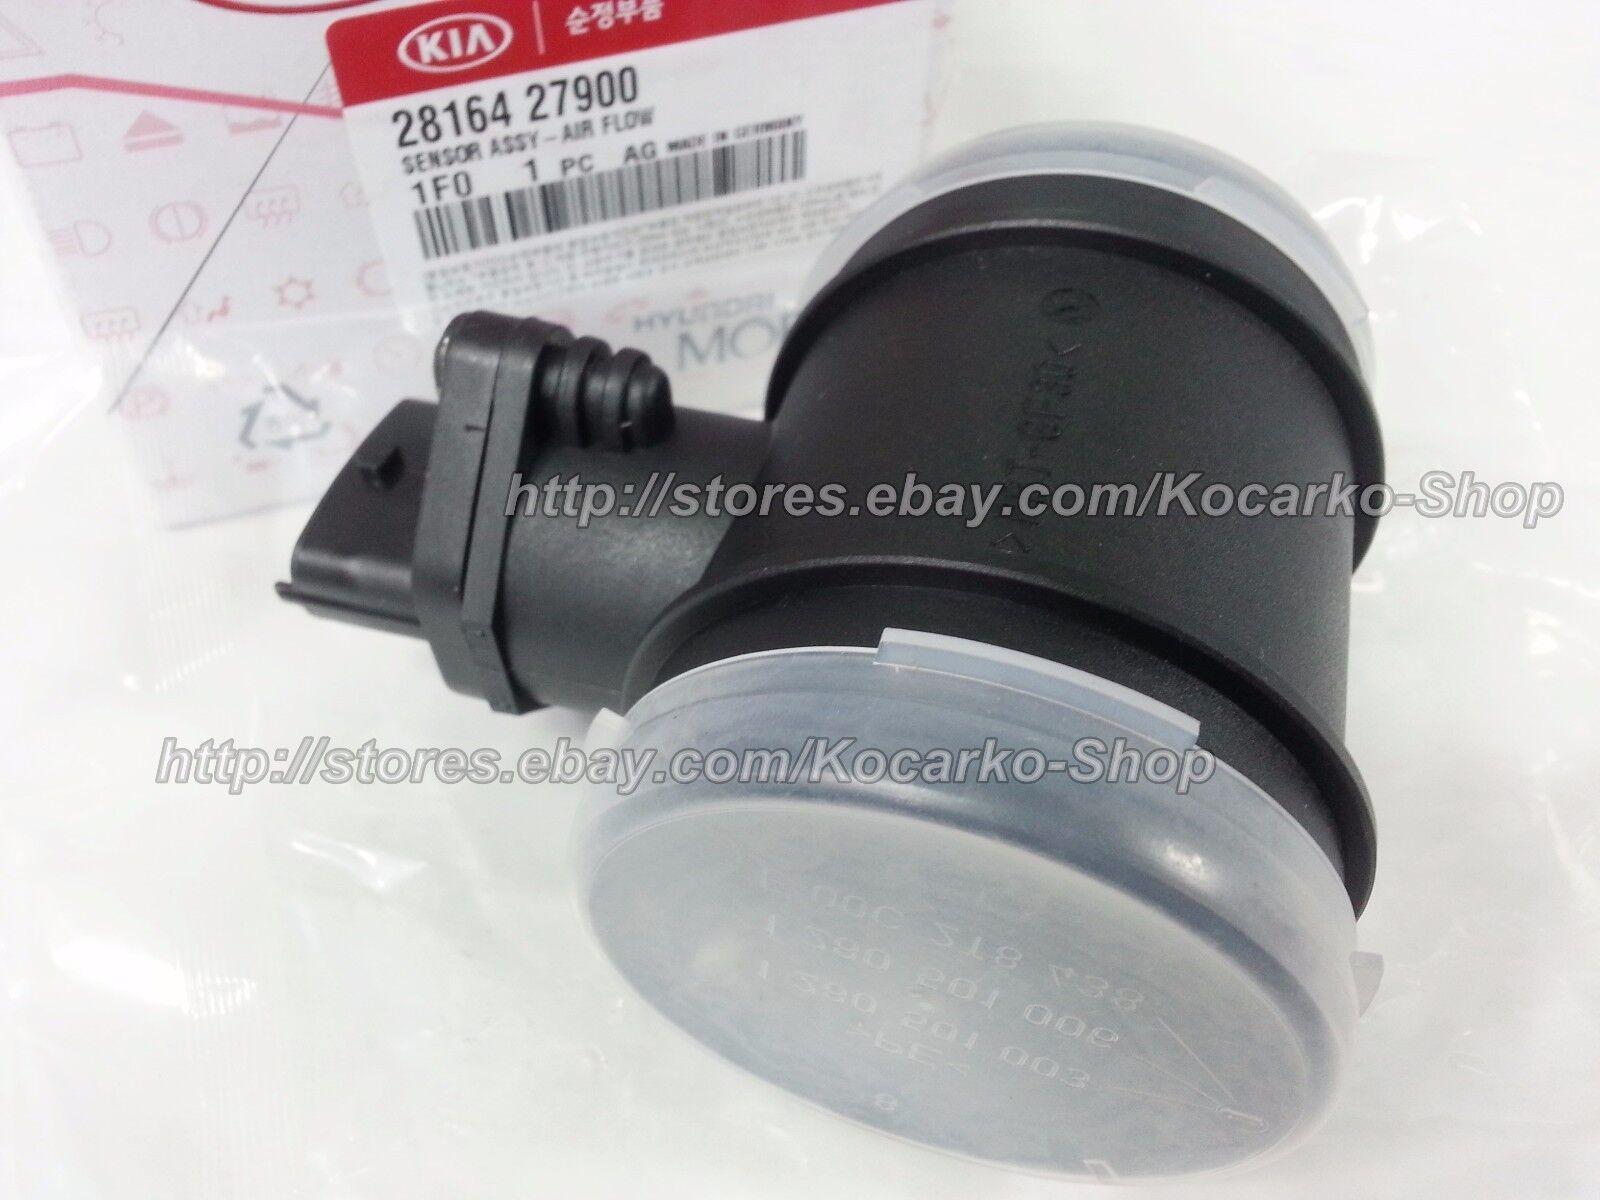 2816427900 OEM 2.0L CRDi Air Flow Sensor Hyundai Santa Fe 2000-2005 Trajet 2000